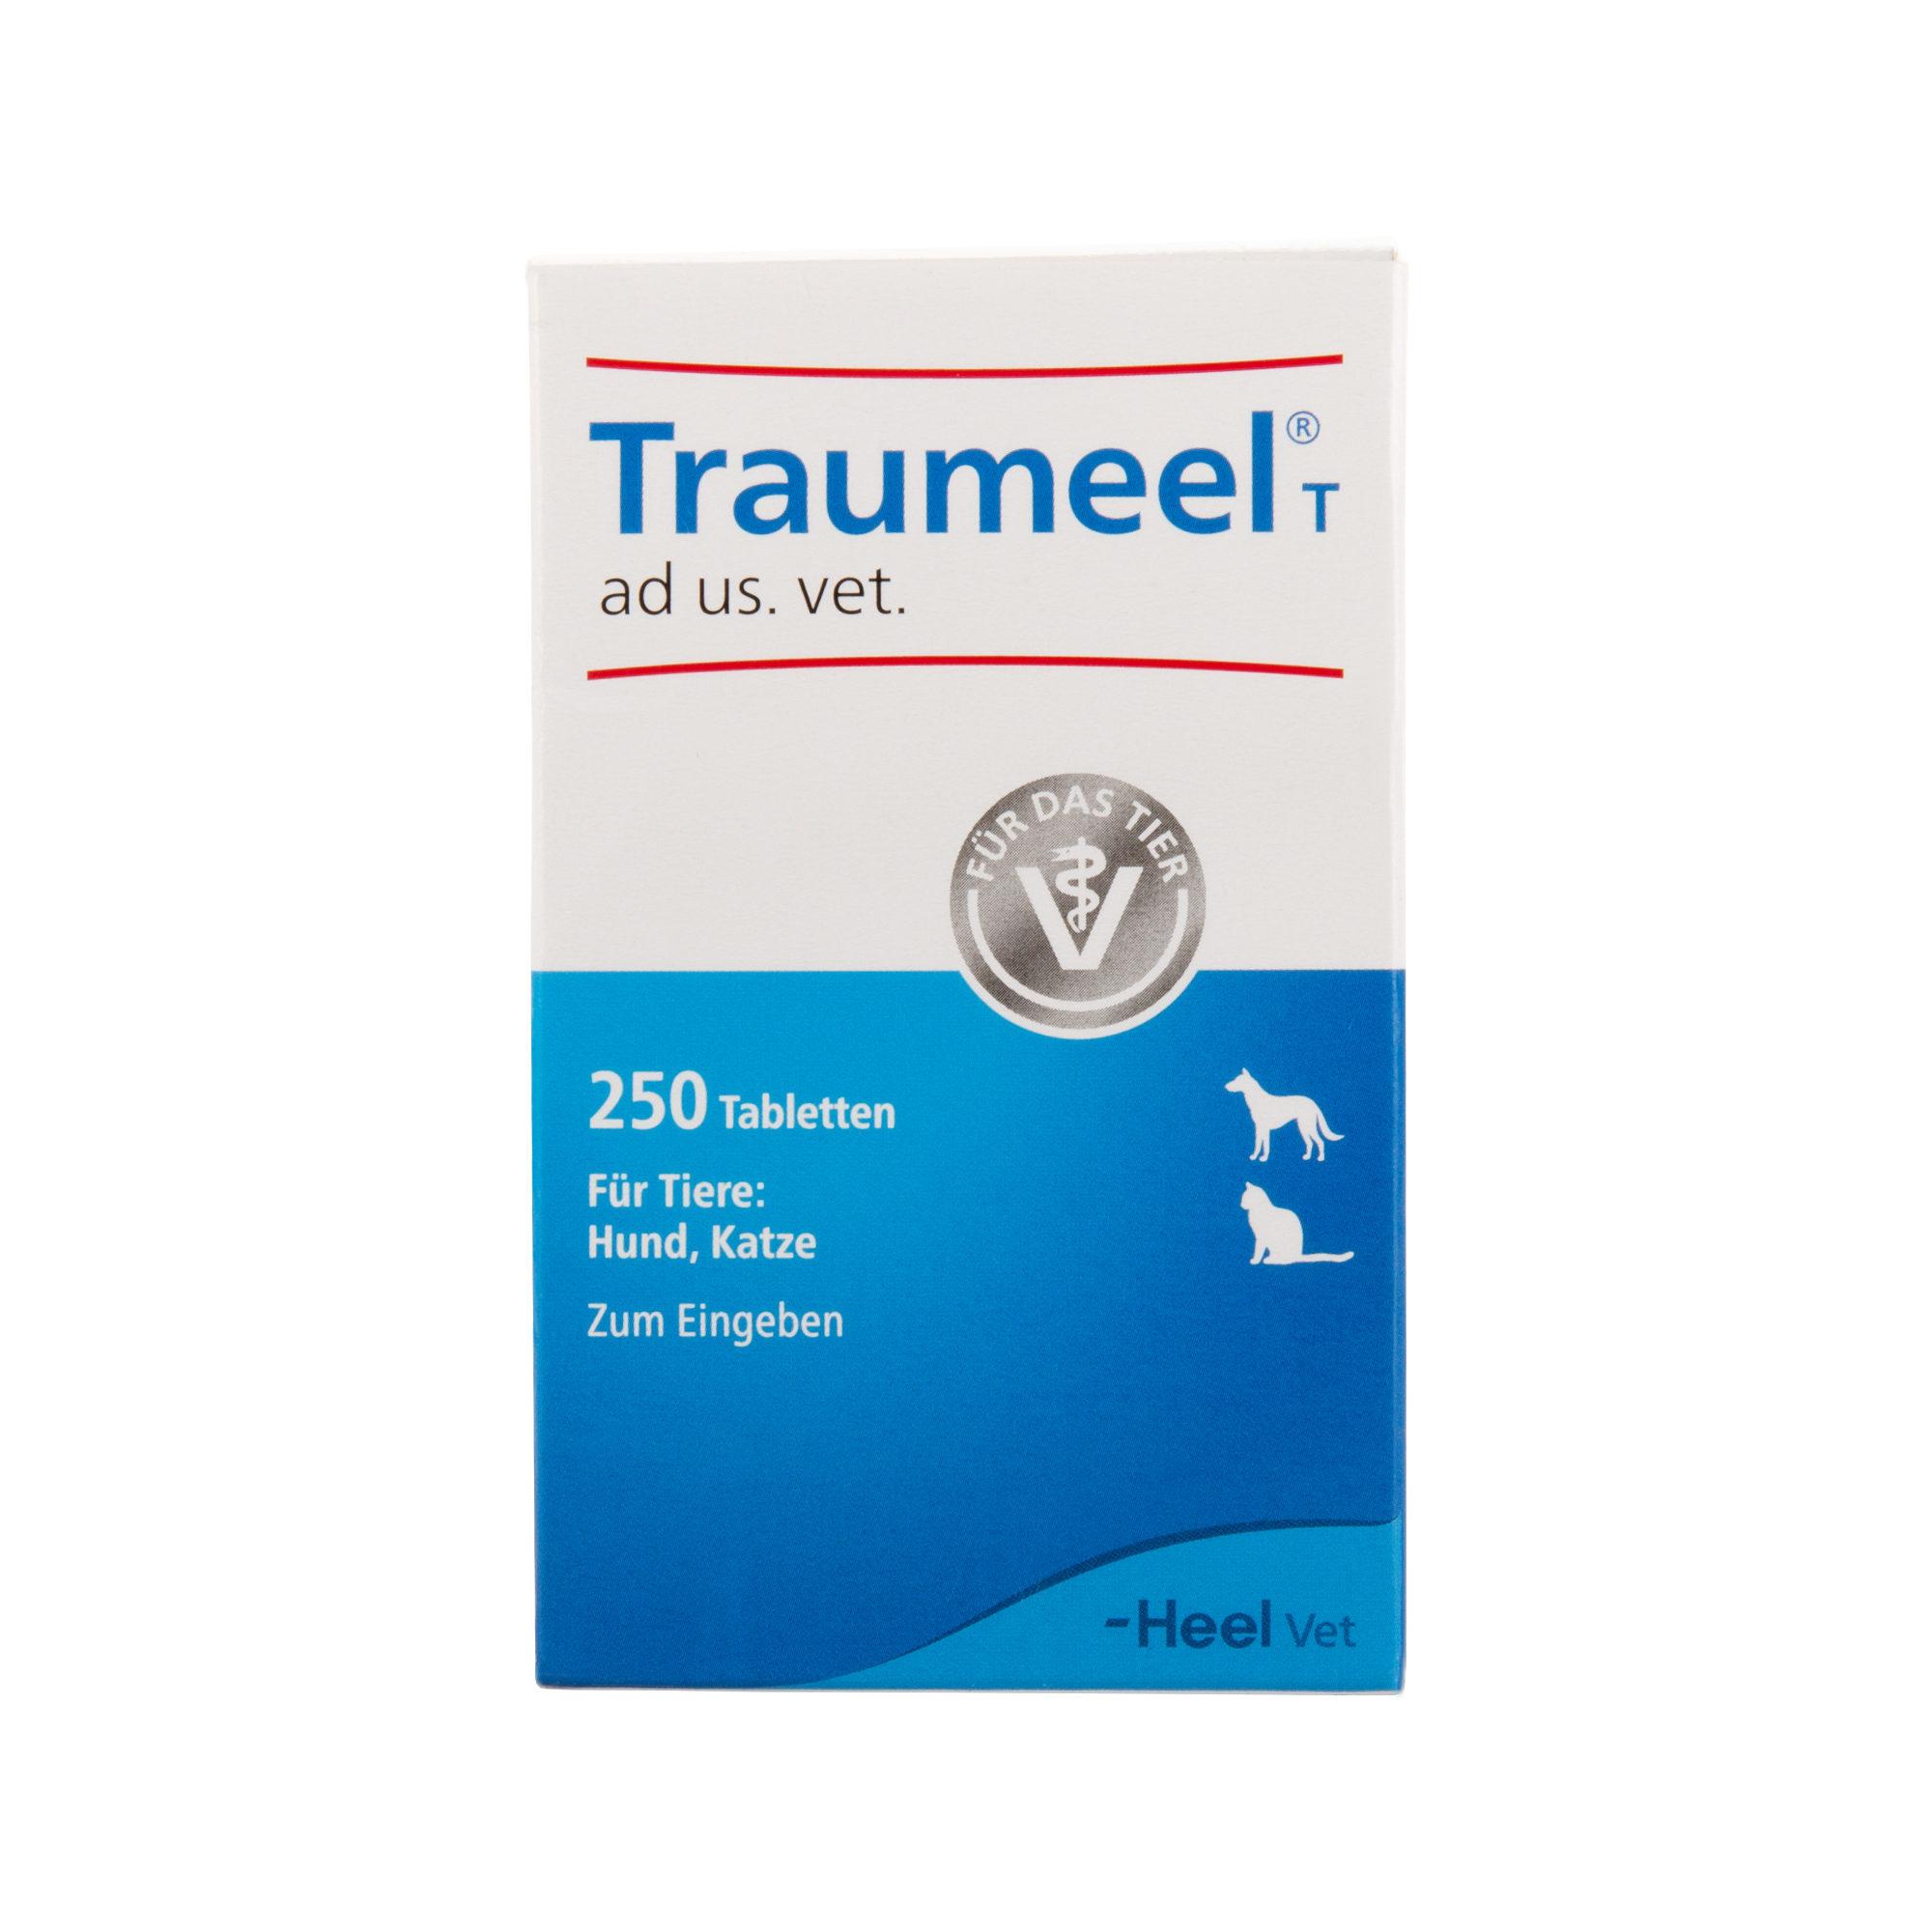 Traumeel T Tabletten - 250 Stück